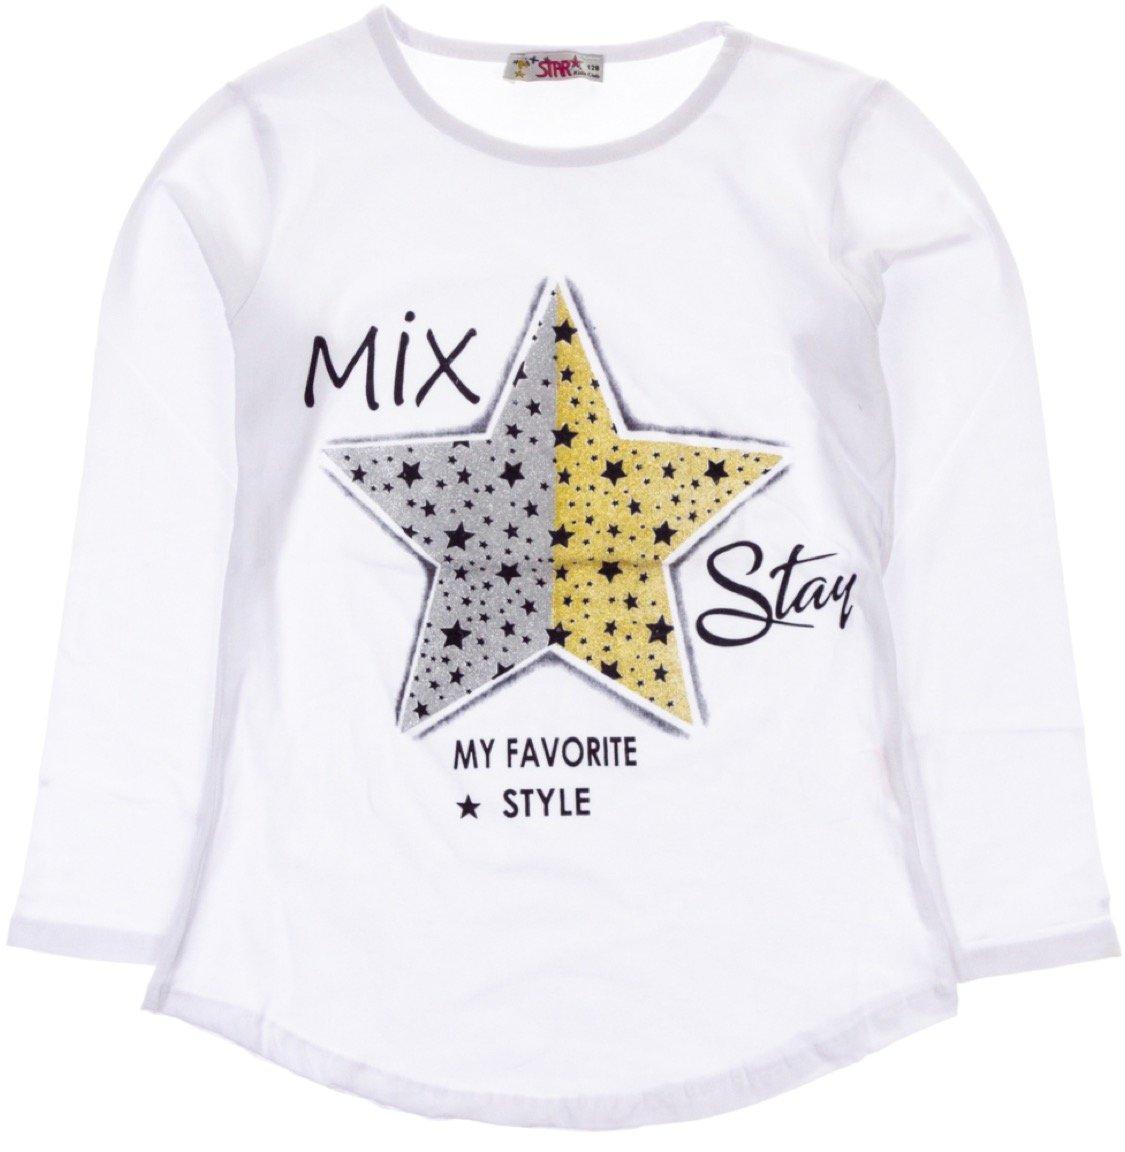 Mix Star παιδική εποχιακή μπλούζα «The Favorite Style»